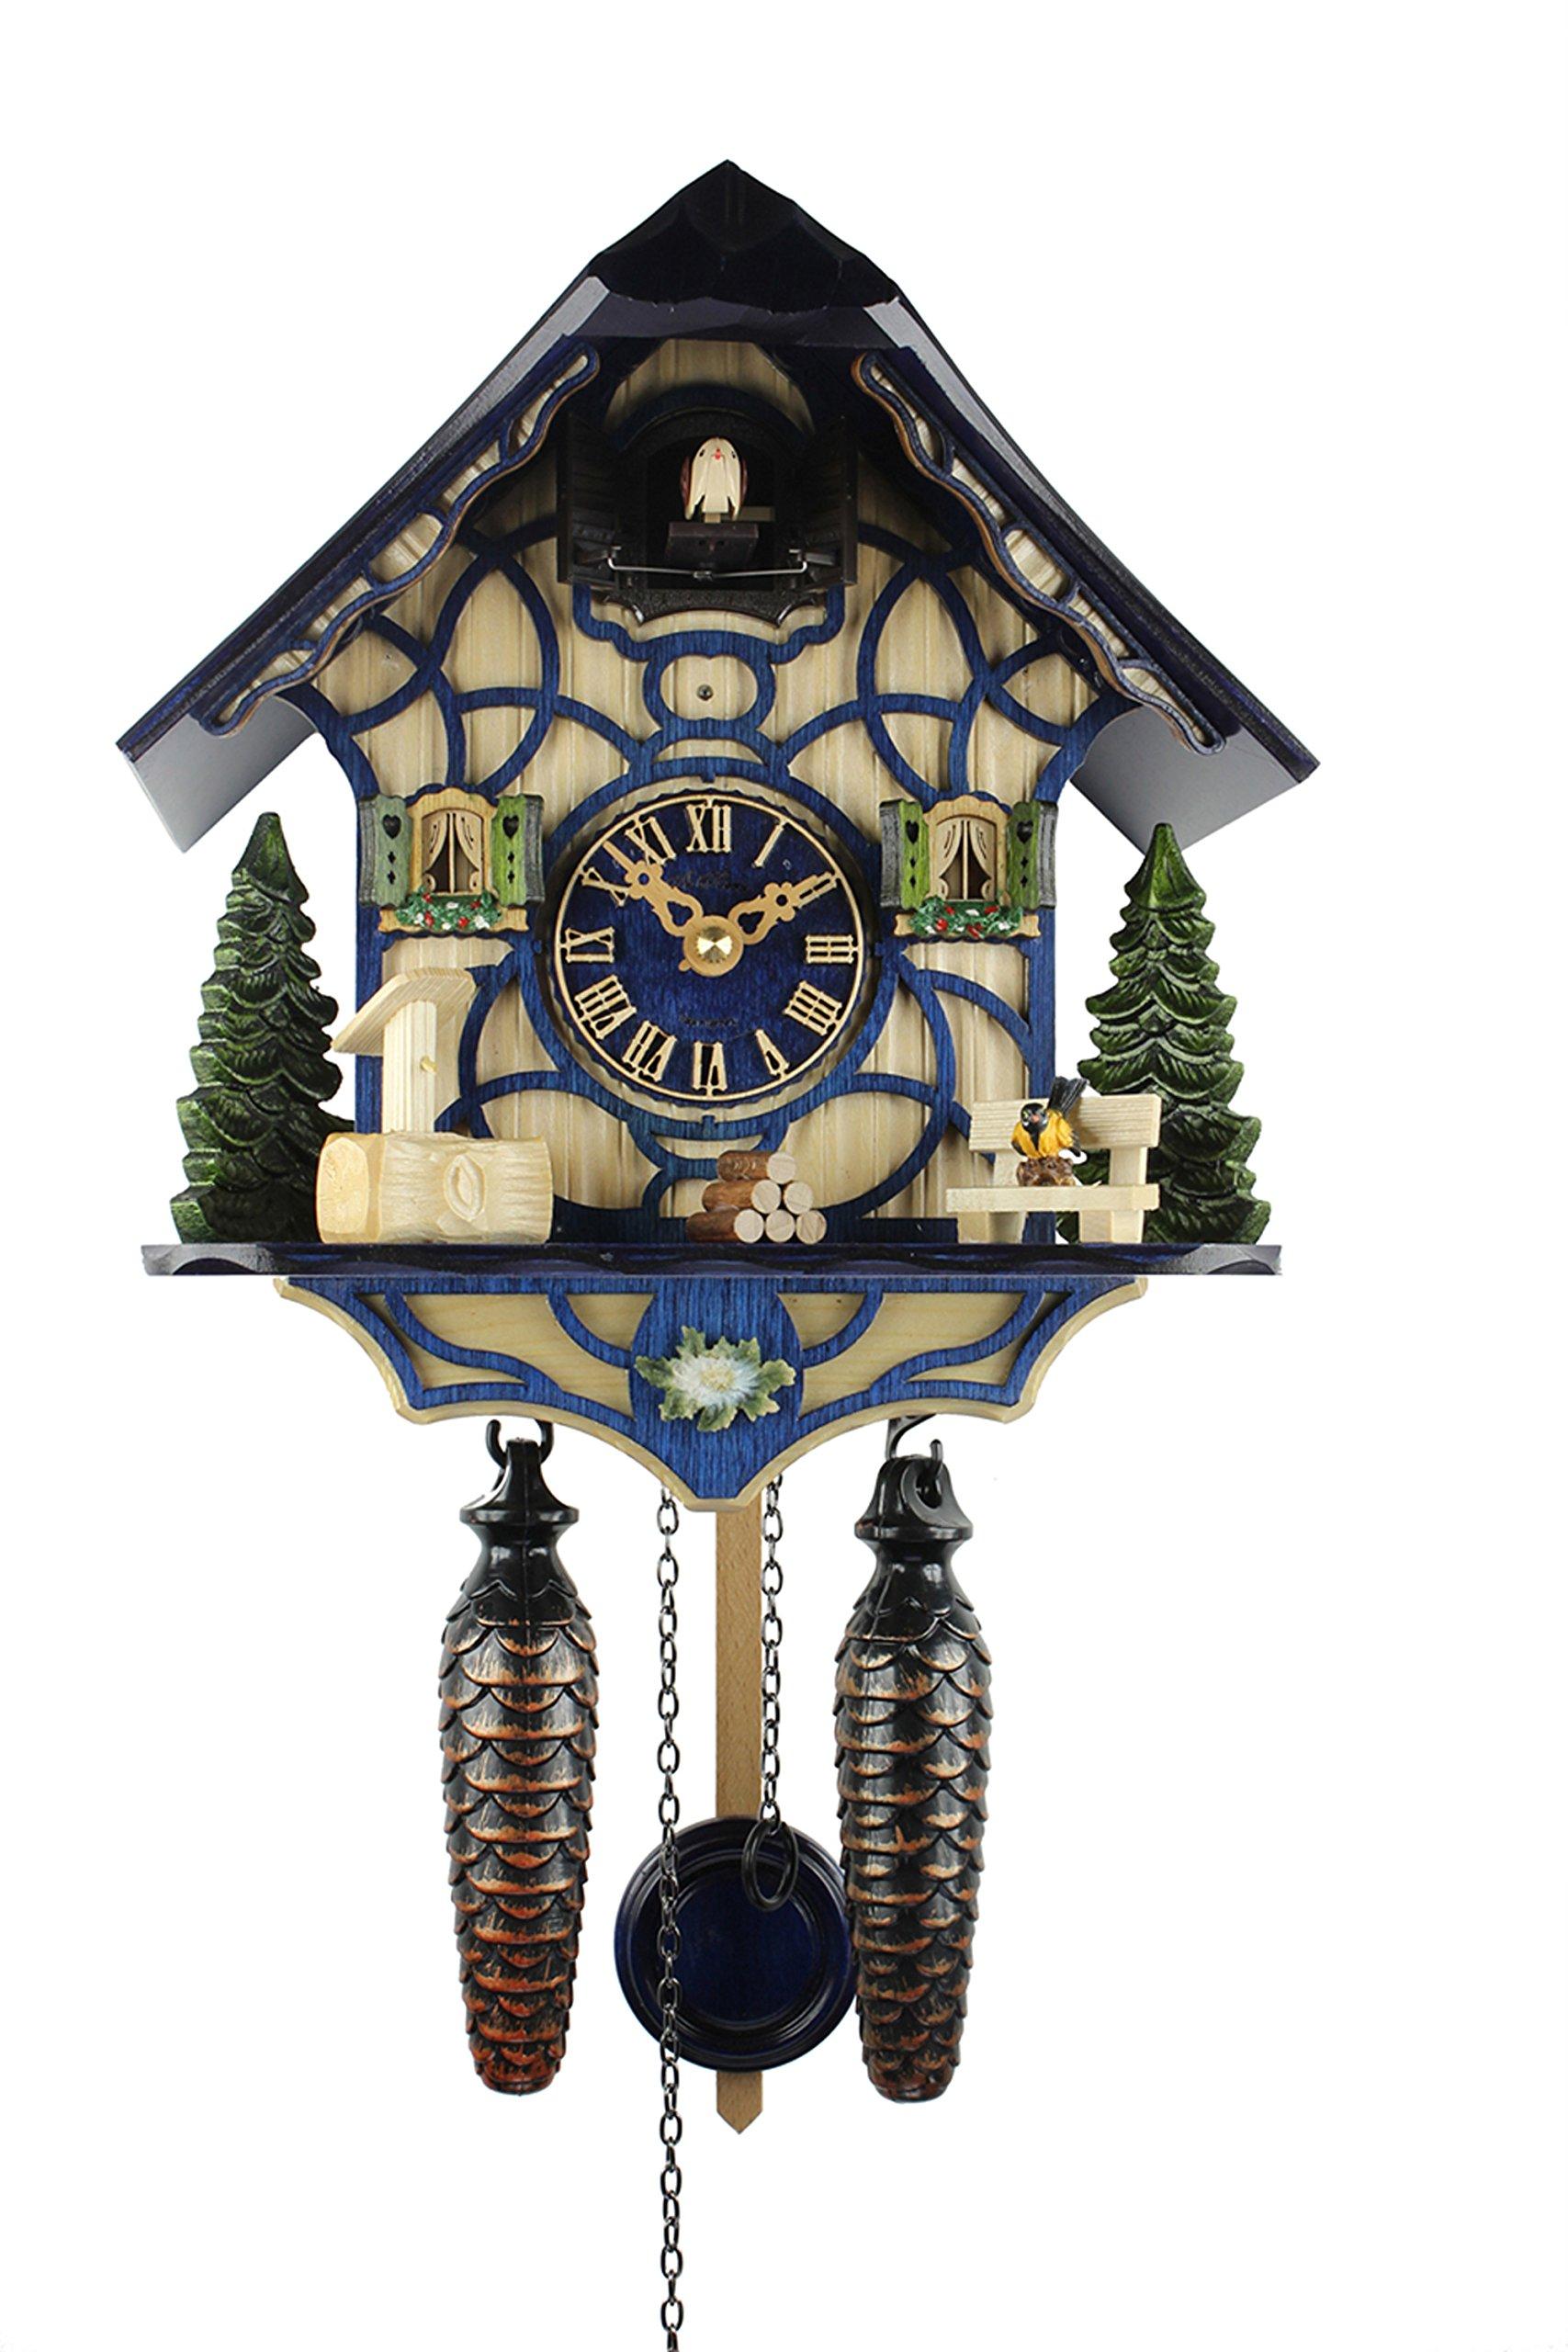 Adolf Herr Quartz Cuckoo Clock - Magic Blue by ISDD Cuckoo Clocks